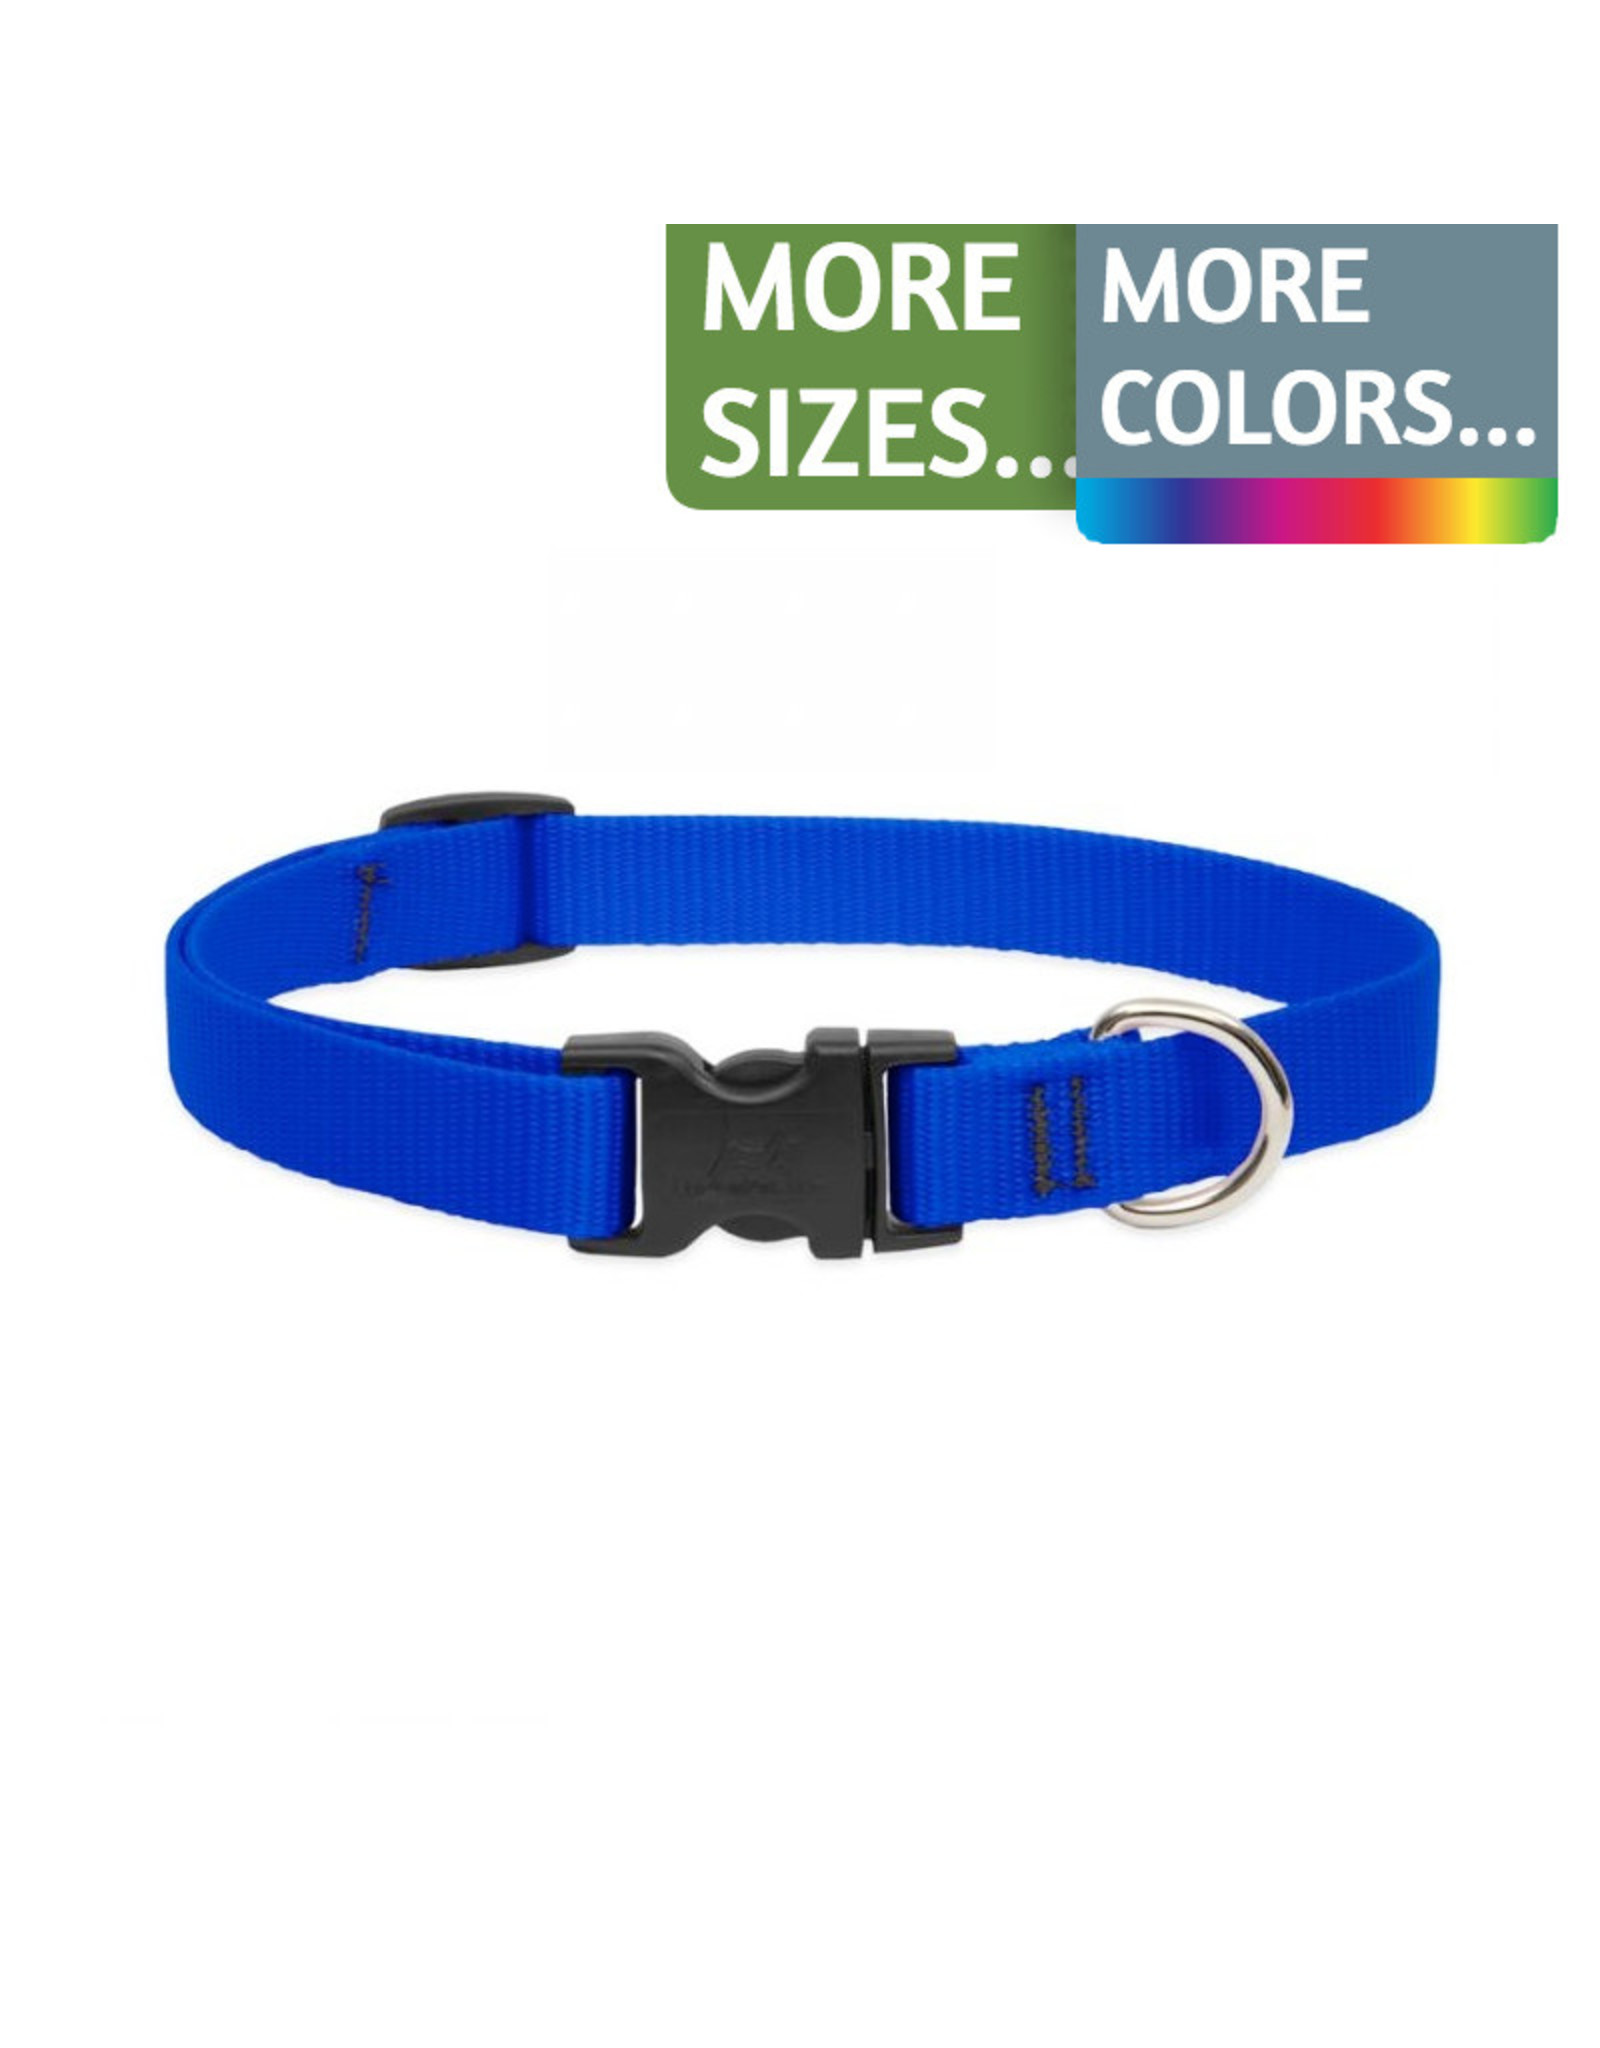 Lupine Lupine 3/4in Wide Adjustable Nylon Dog Collar